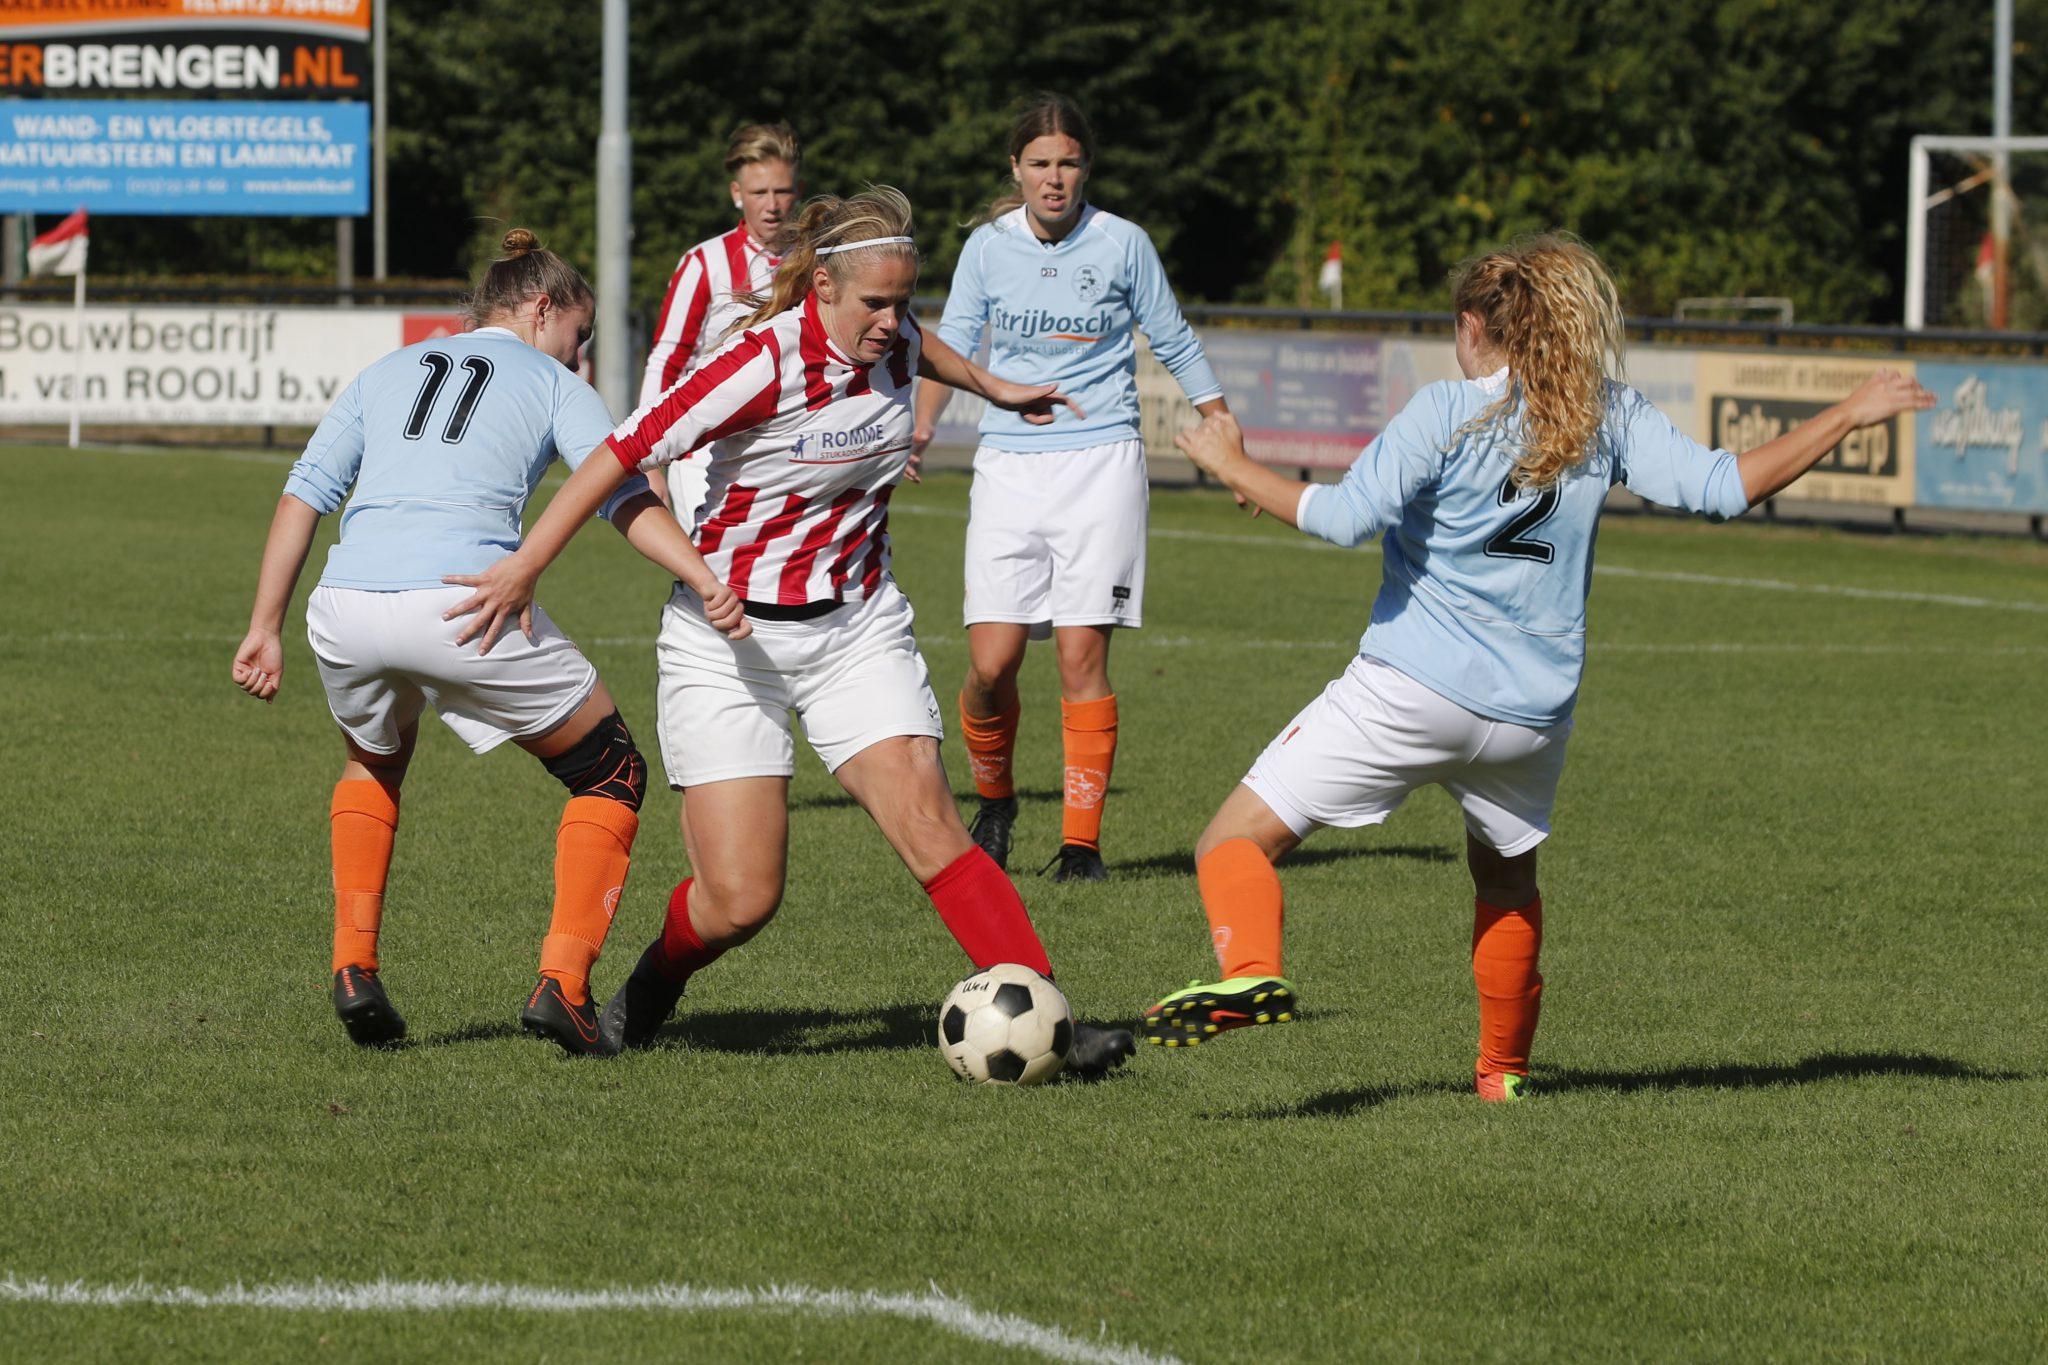 Selectie oefenwedstrijd Nooit Gedacht VR1 - FC Kunde VR1